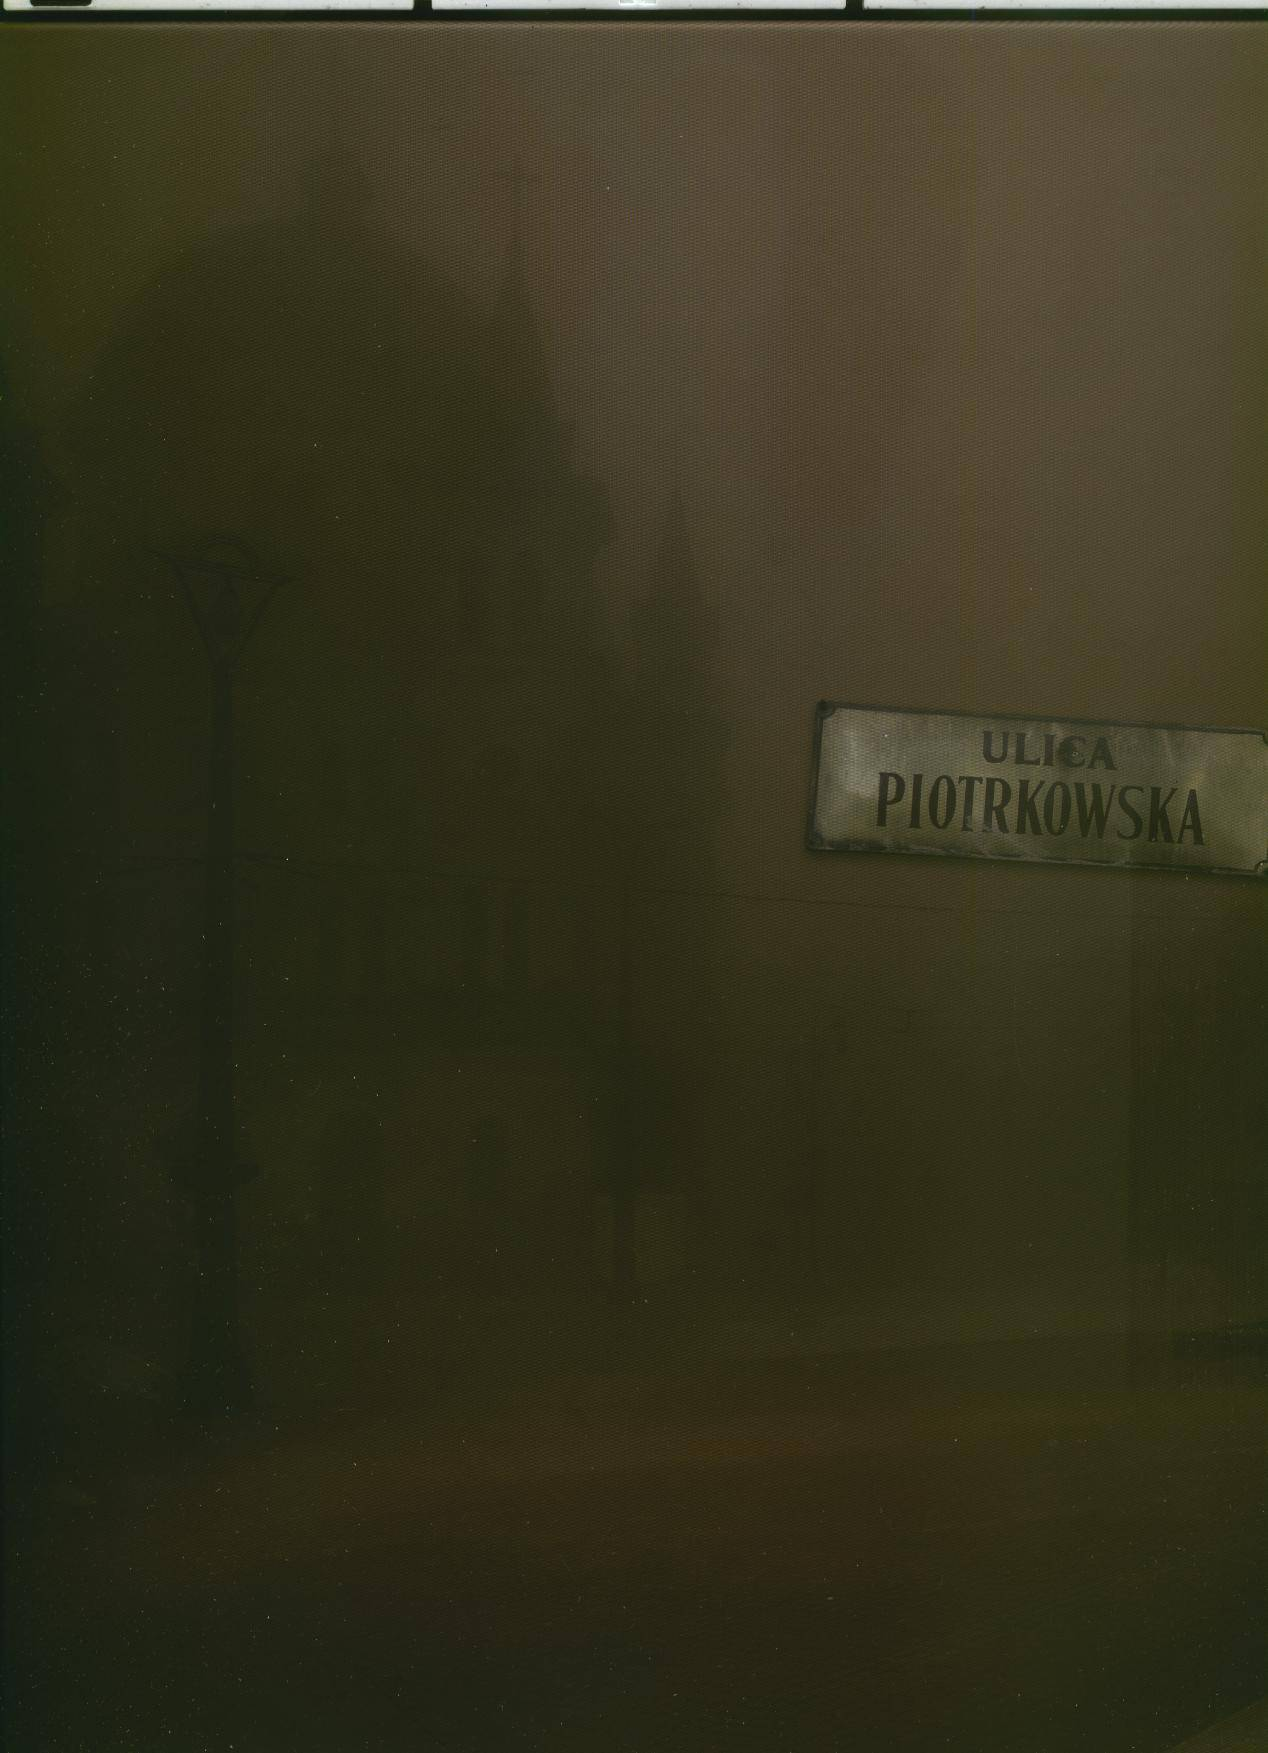 Ulica Piotrkowska spacer pierwszy/spacer drugi (komplet)